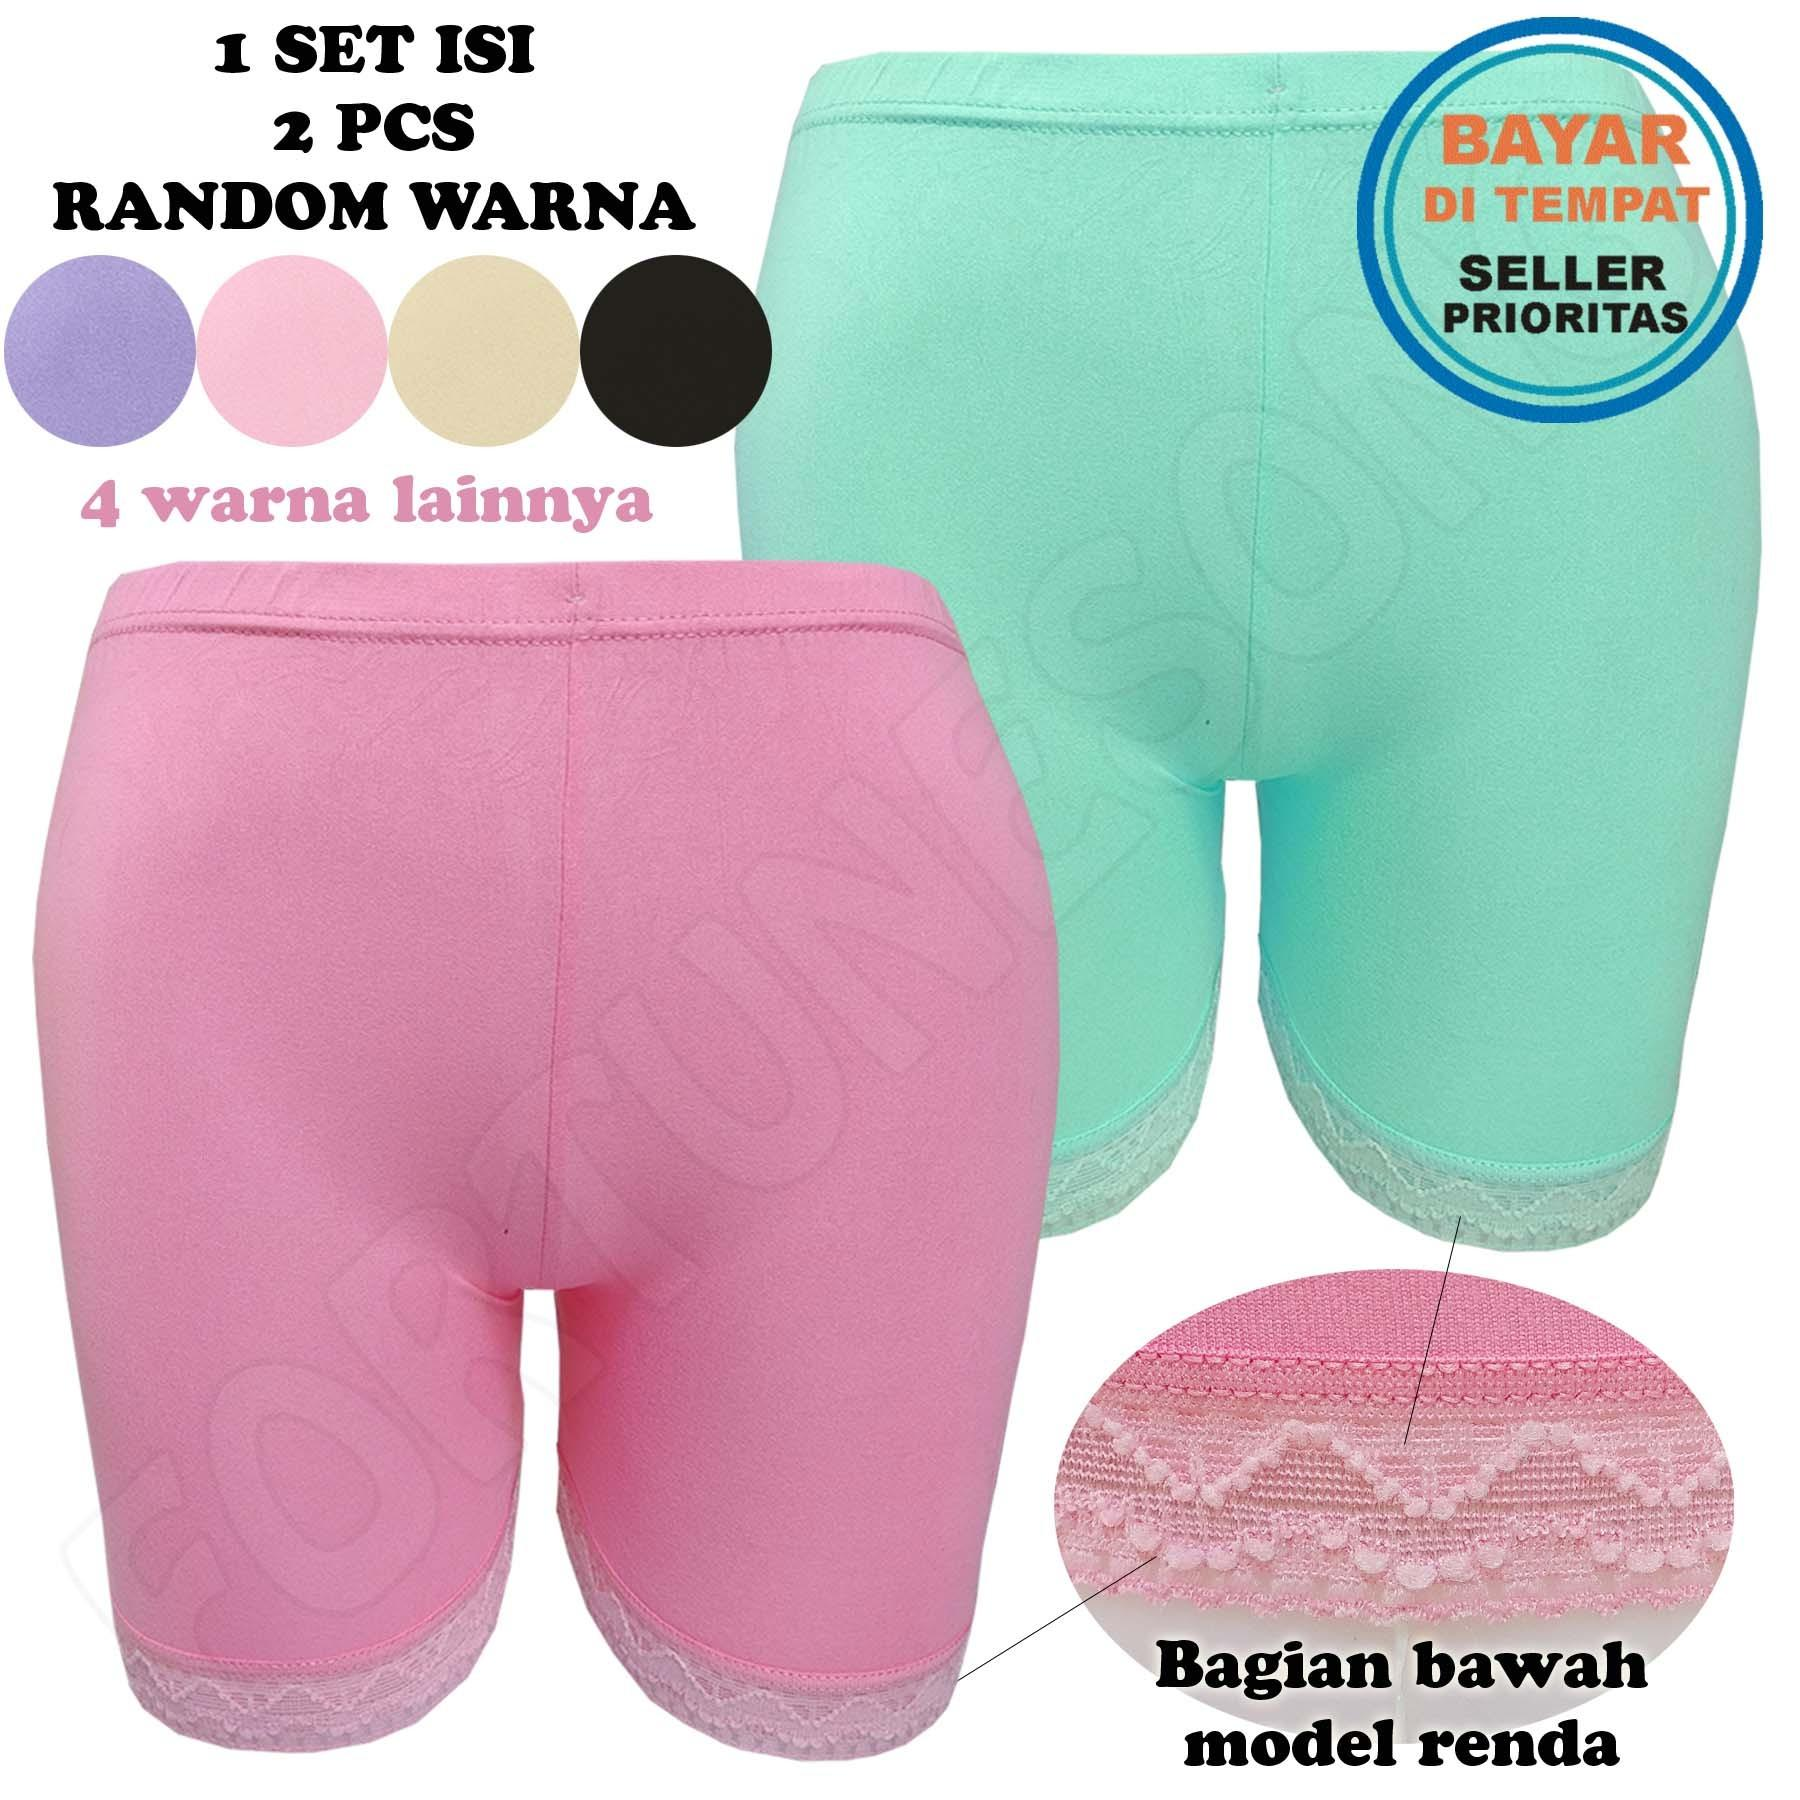 Fs'Fashion - 2 Pcs Celana Dalam Wanita Legging Pendek Renda Aneka Warna